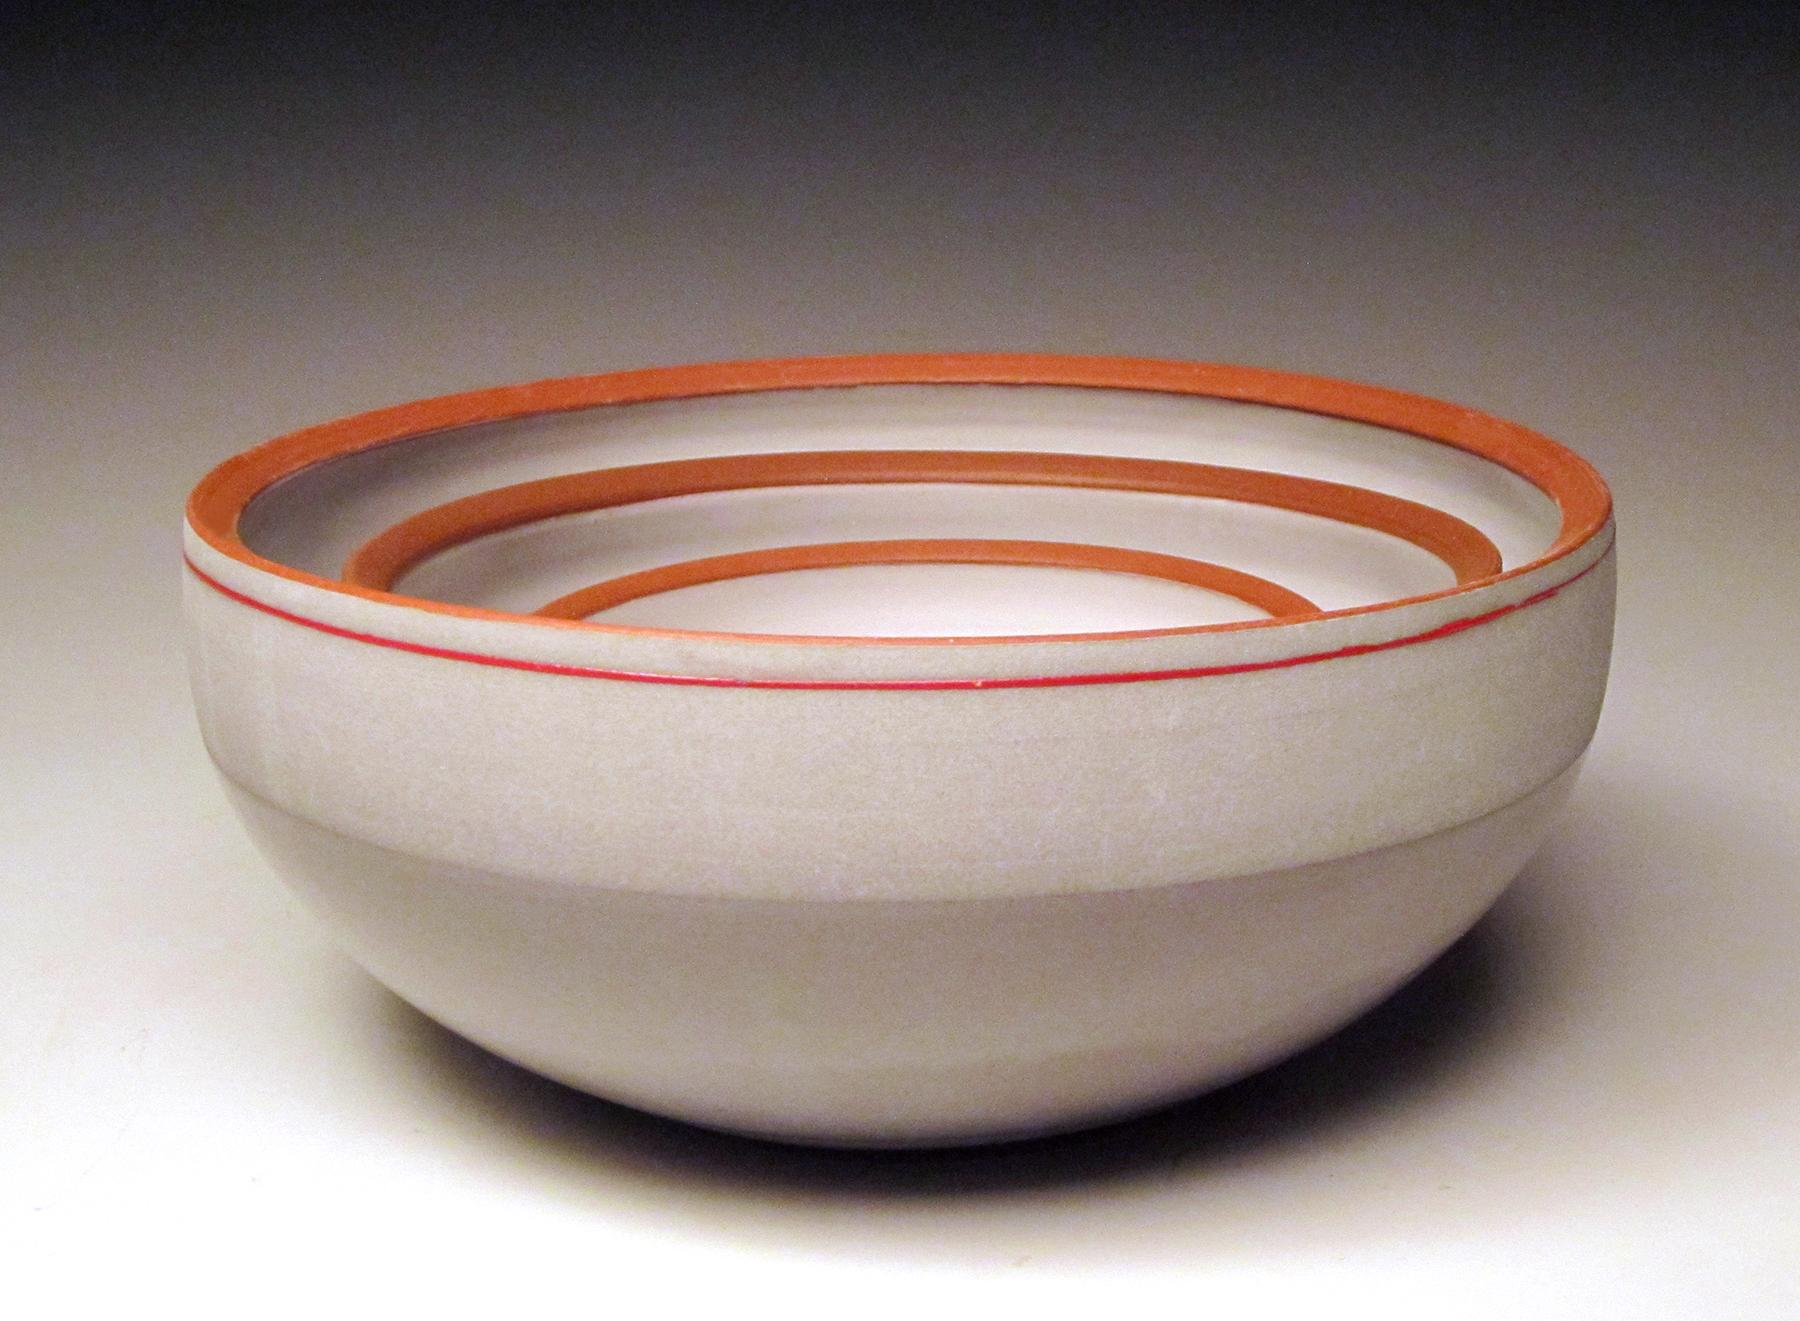 watson apf bowl set 2.jpg